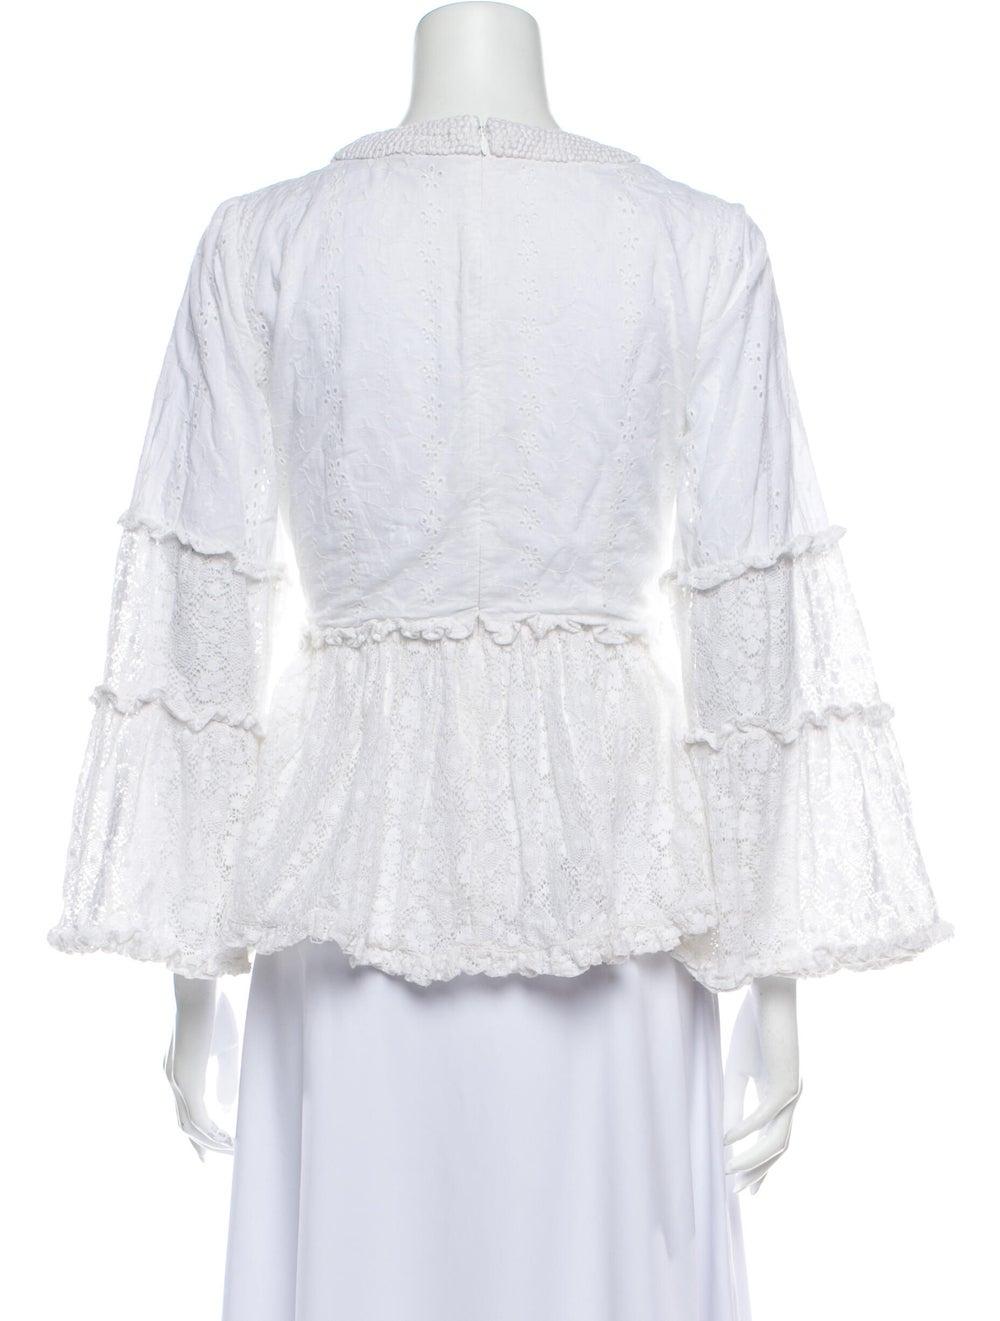 Alexis Lace Pattern V-Neck Blouse White - image 3